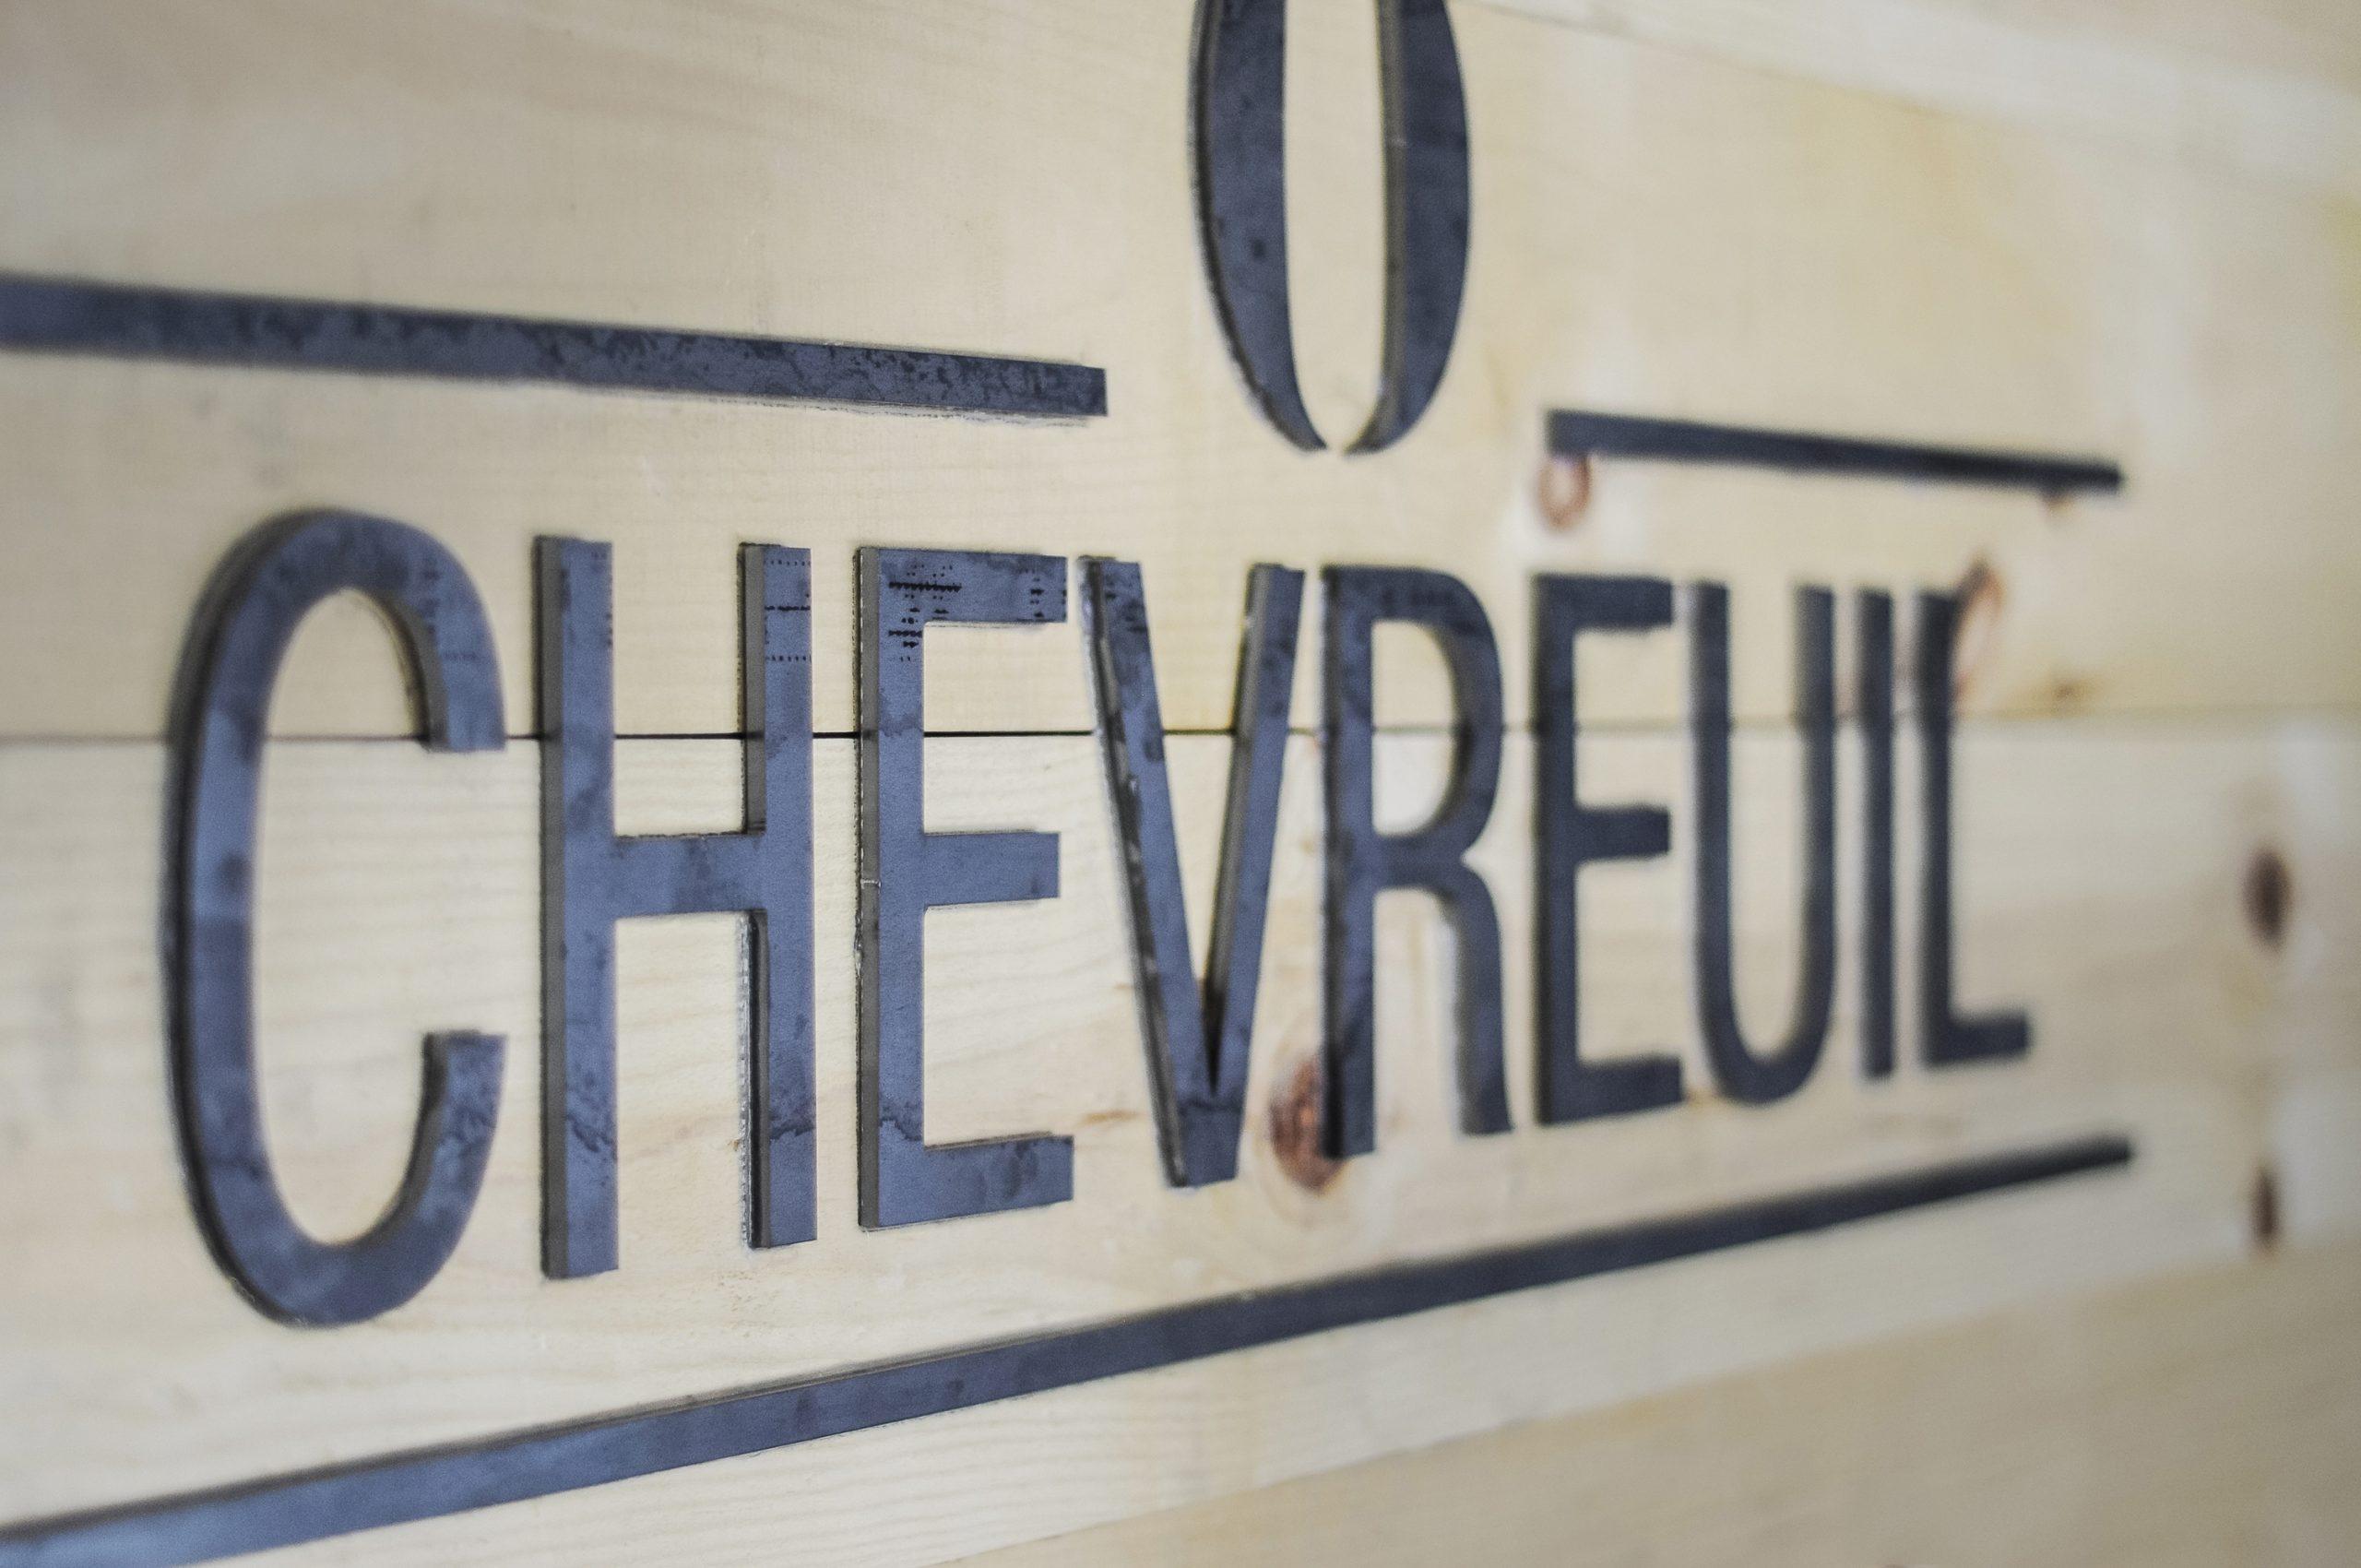 O Chevreuil Cecobois 10